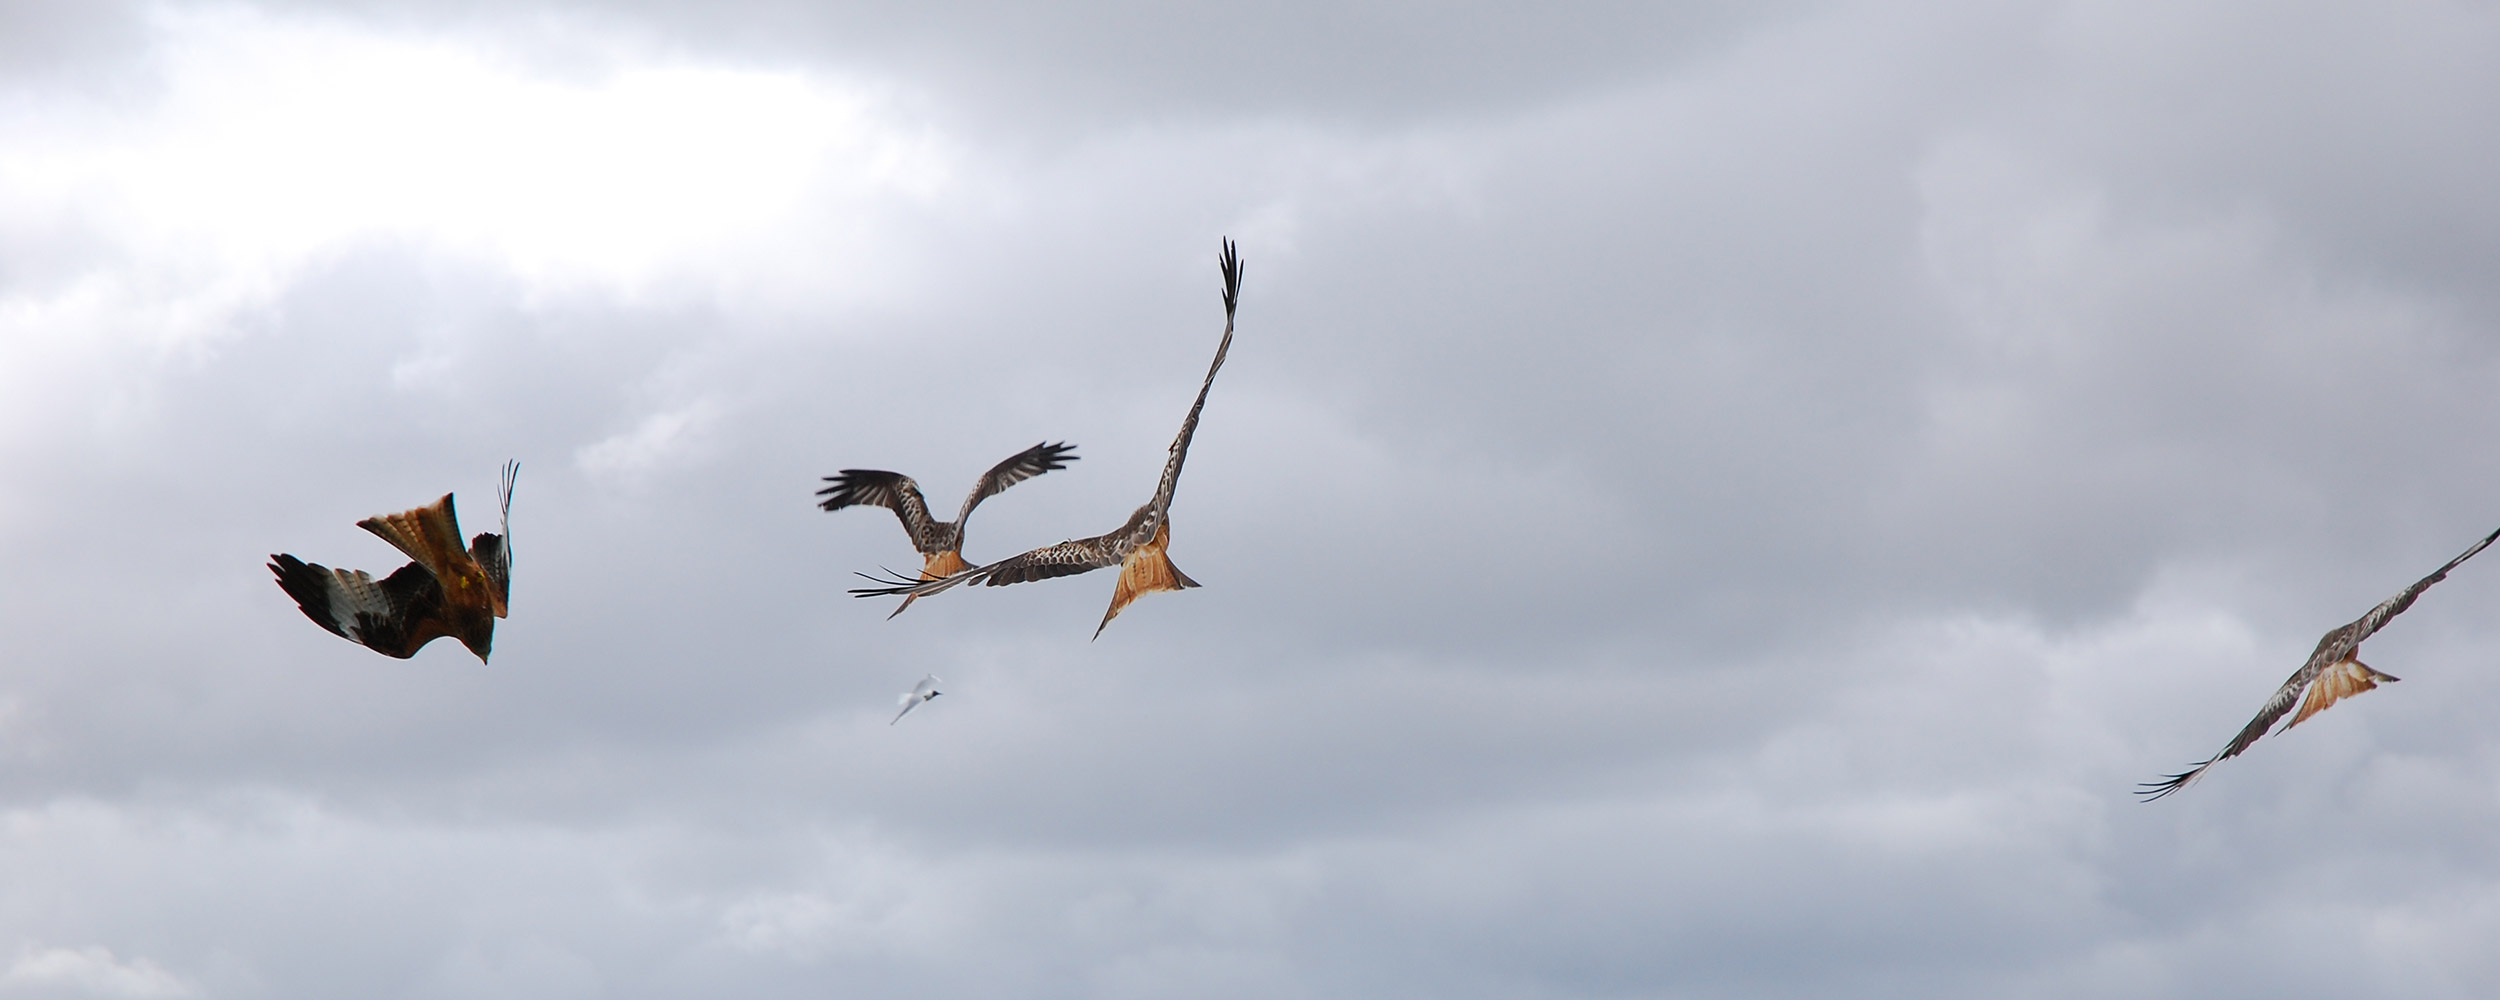 14.-Red-kite-feeding-station,-Dumfries-&-Galloway.jpg